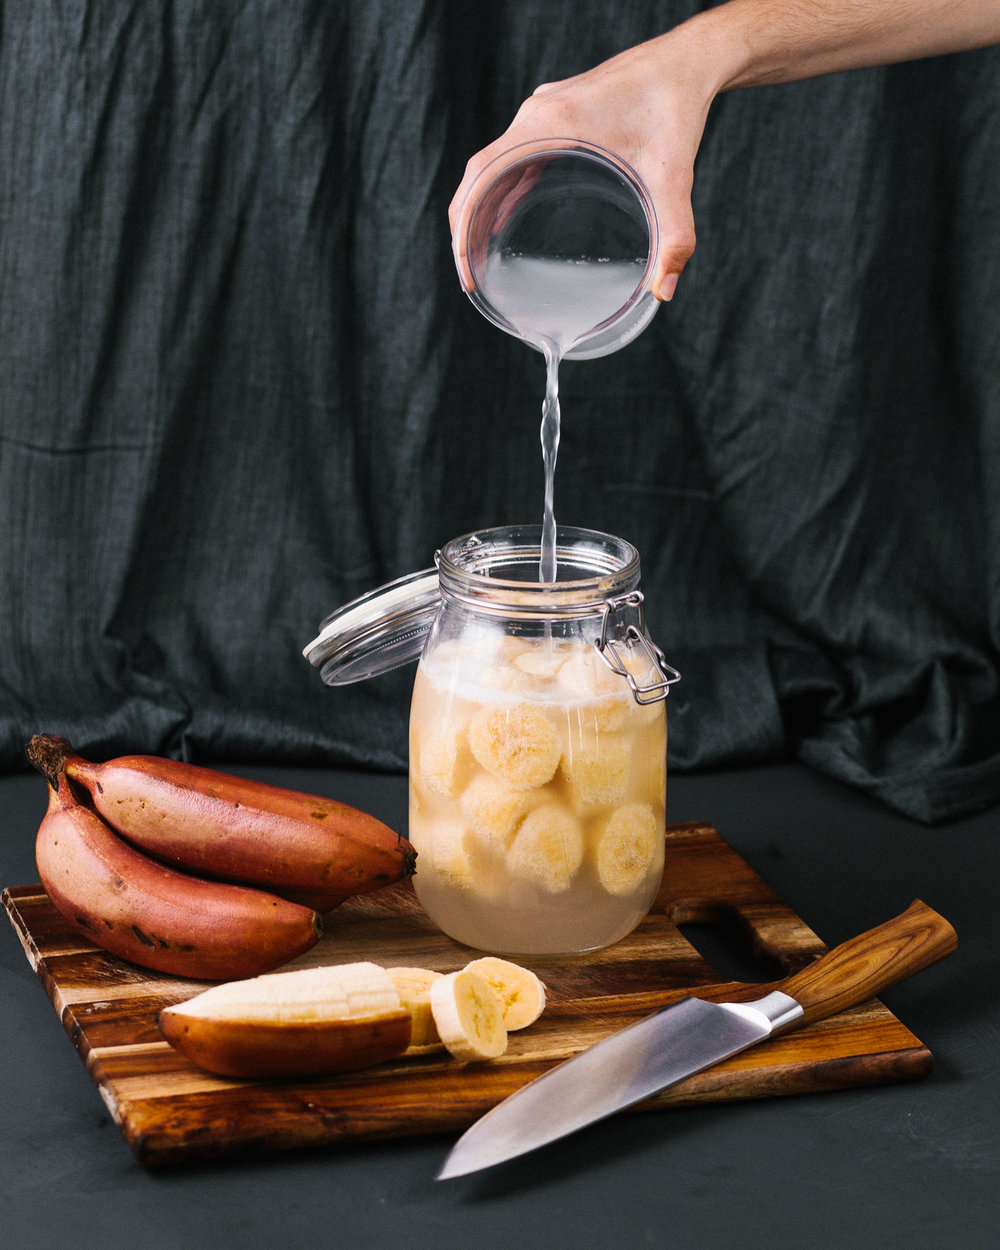 Cultured_Bananas_By_Jordan_Pie_Nutritionist_Photographer2-1.jpg